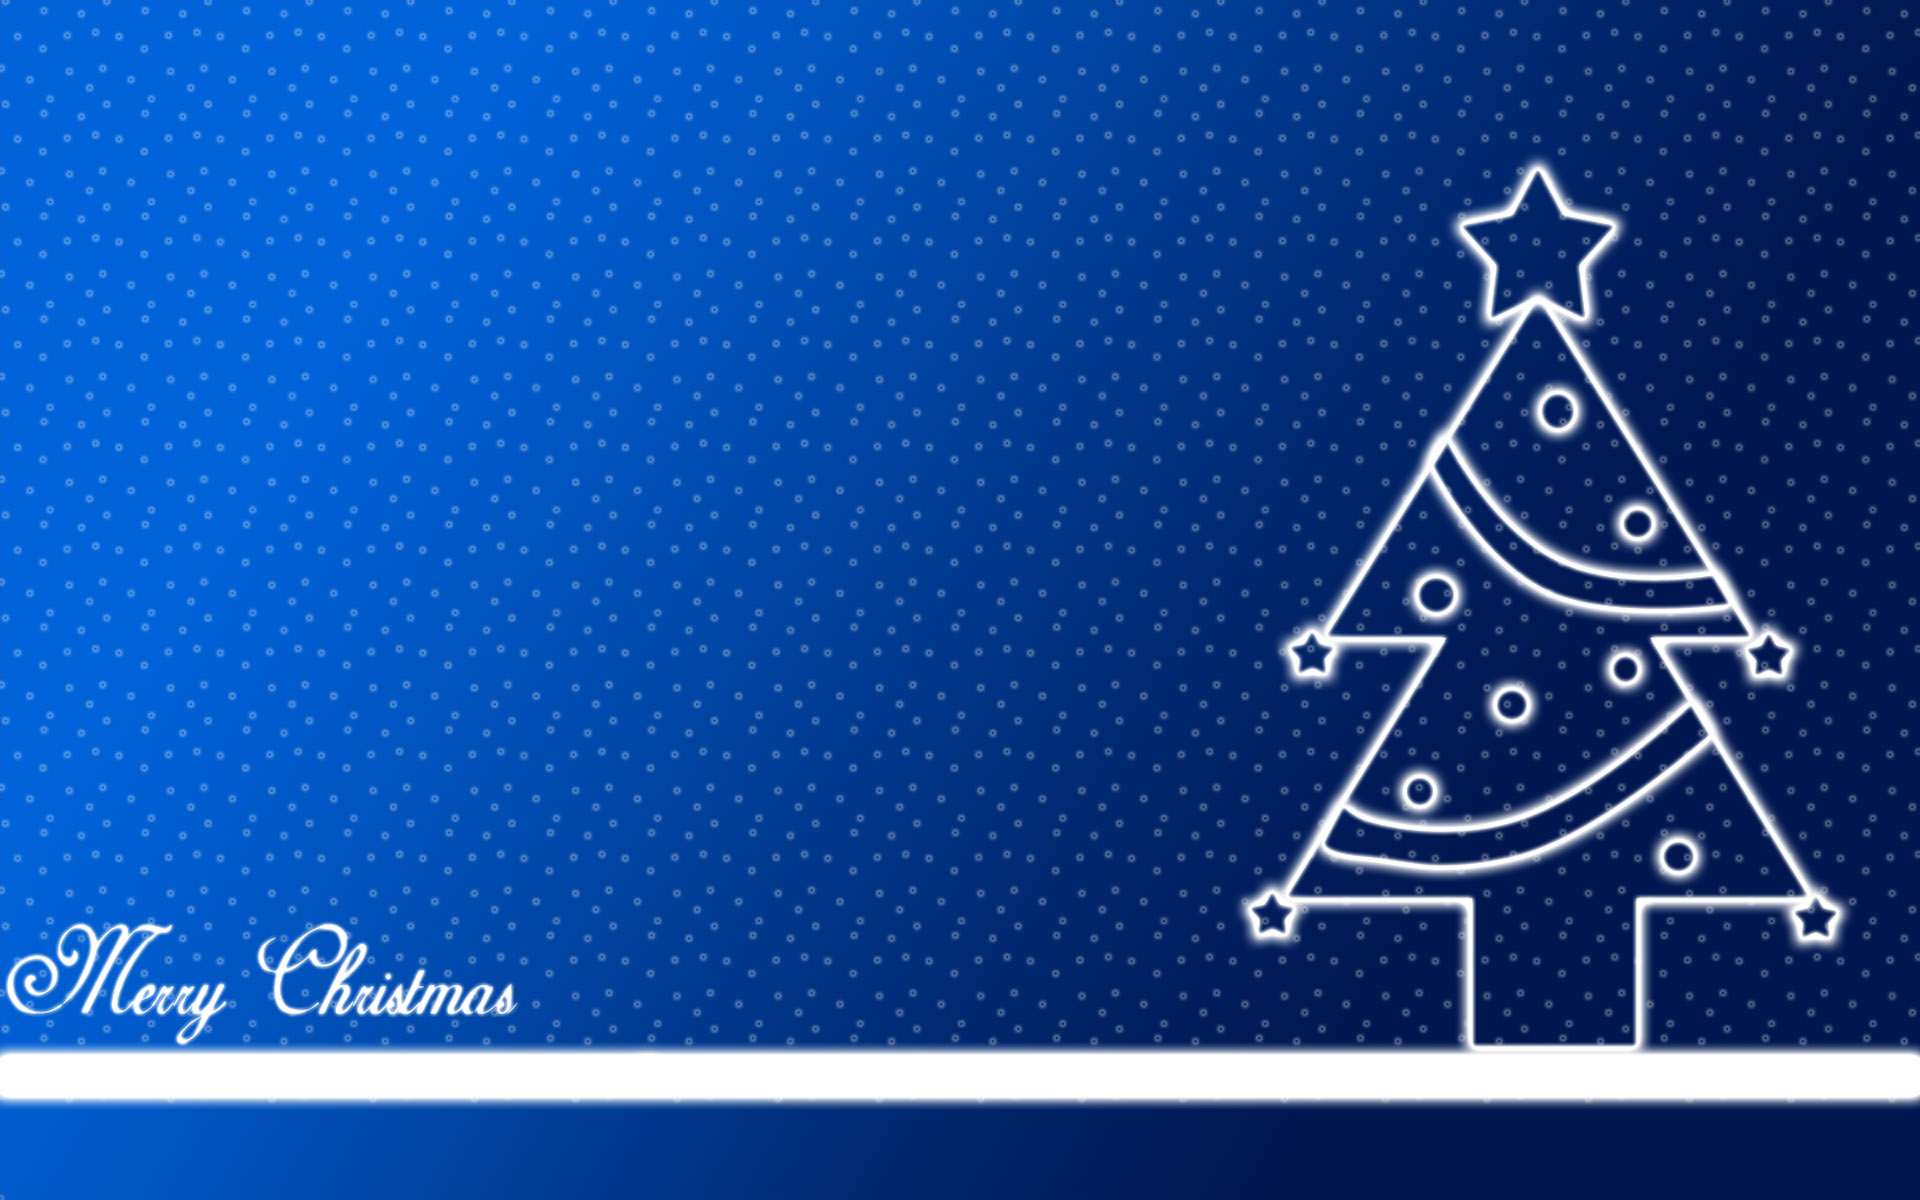 Happy Merry Christmas Wallpaper Laptop